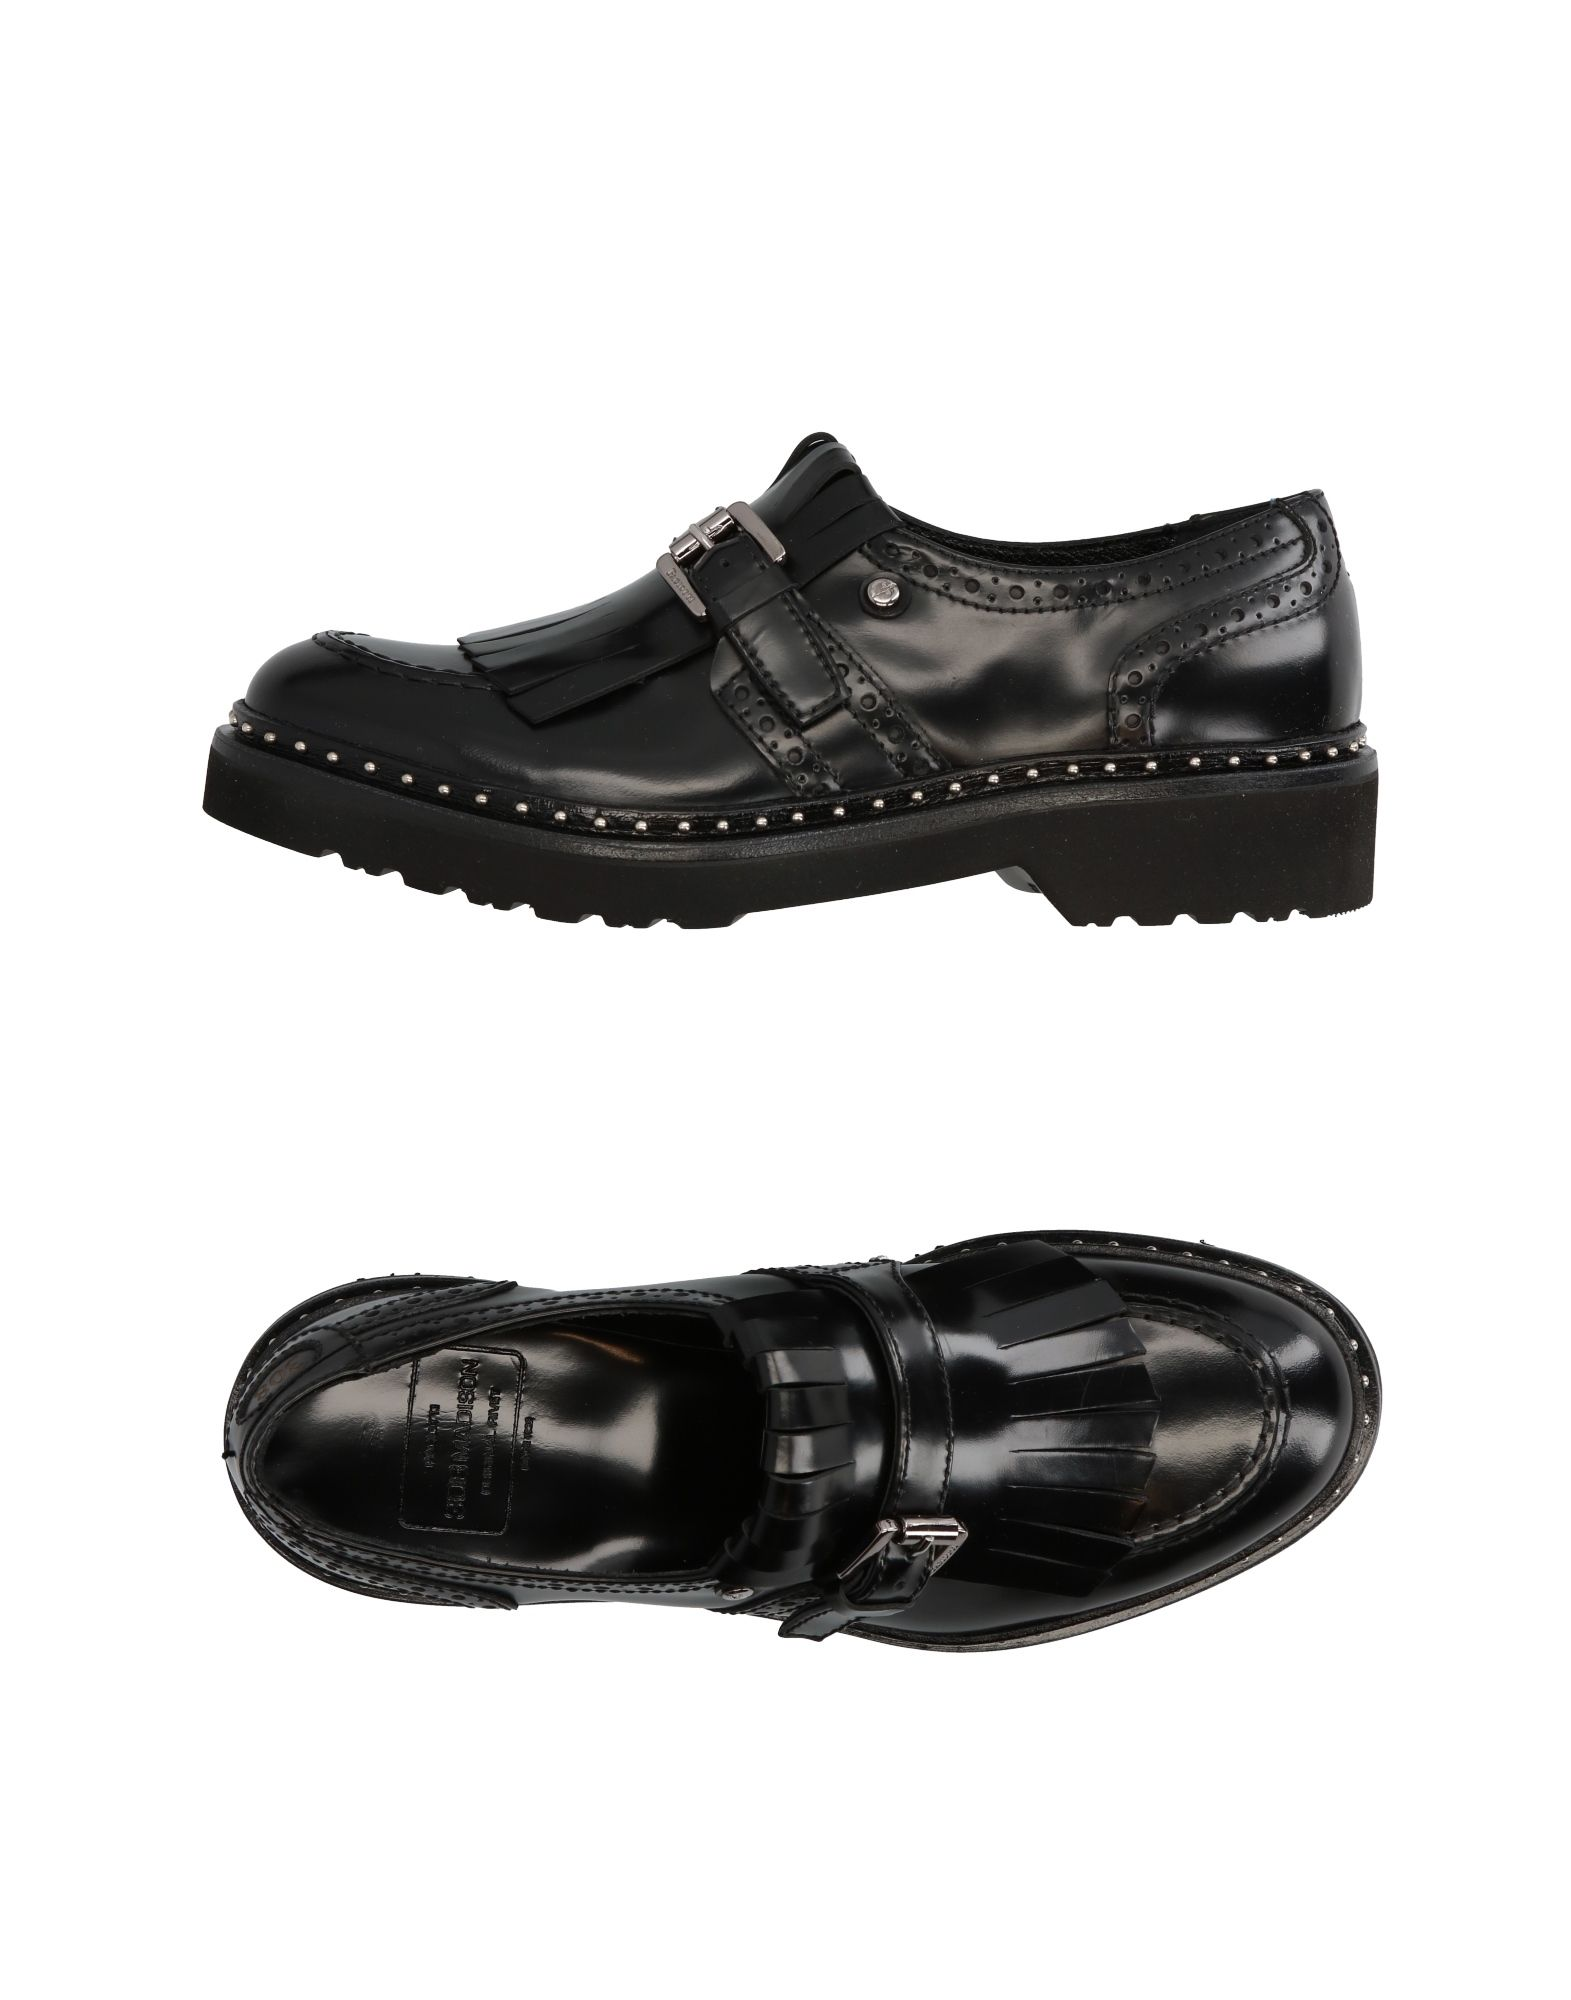 Paciotti 308 Madison 11280147JVGut Nyc Mokassins Damen  11280147JVGut Madison aussehende strapazierfähige Schuhe 930410